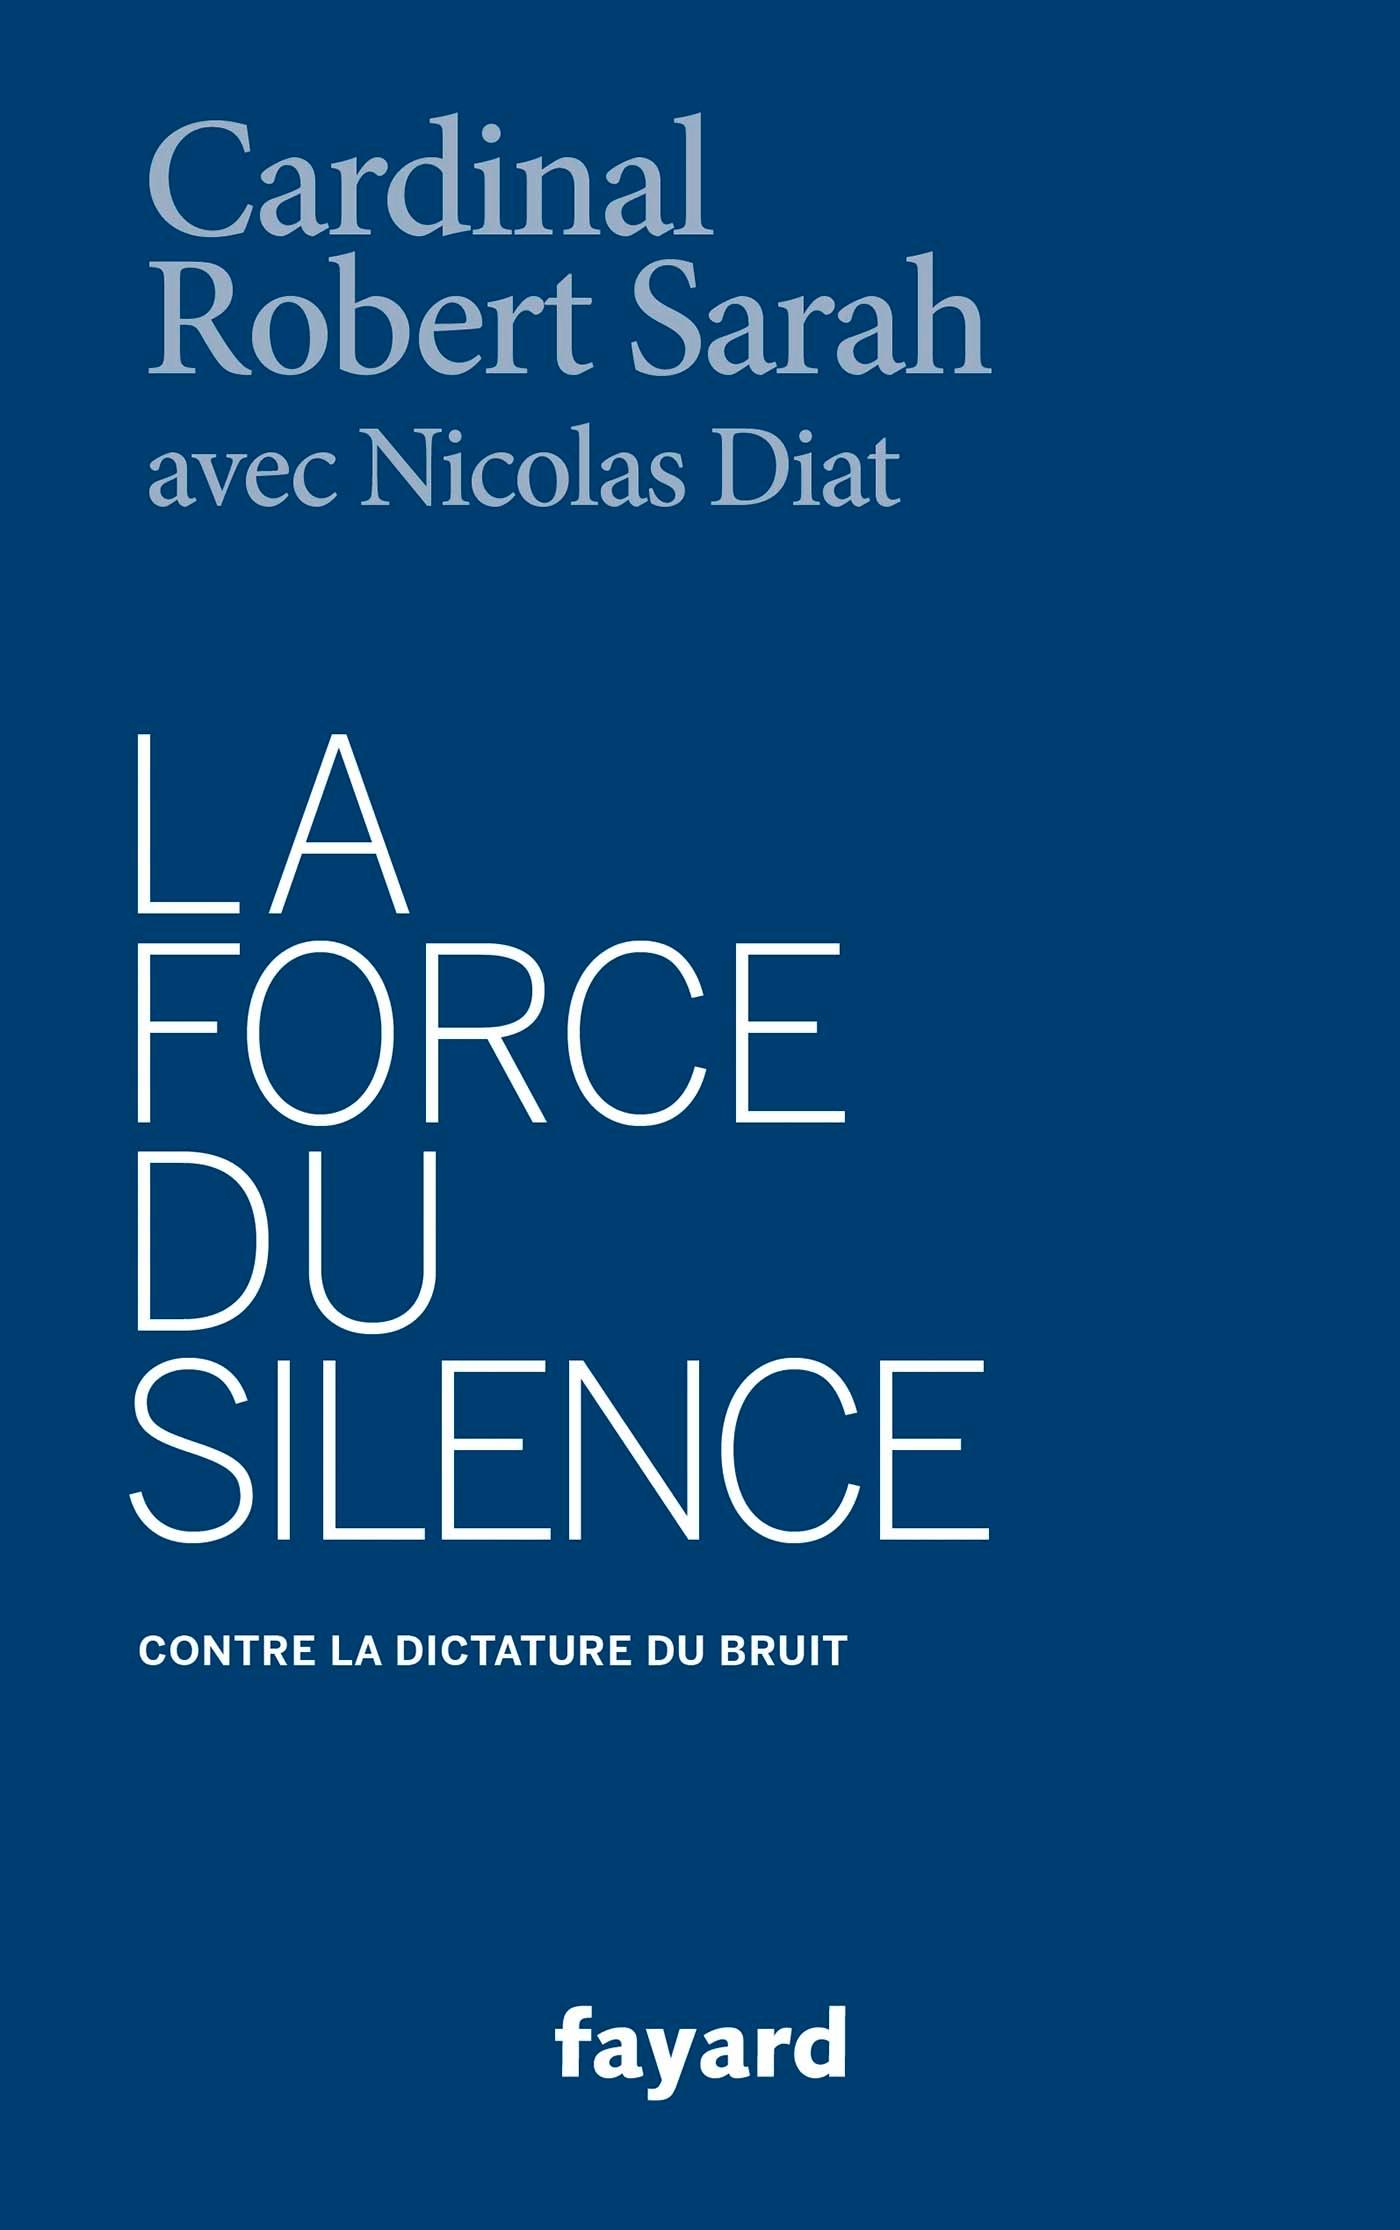 La force du silence © Éditions Fayard